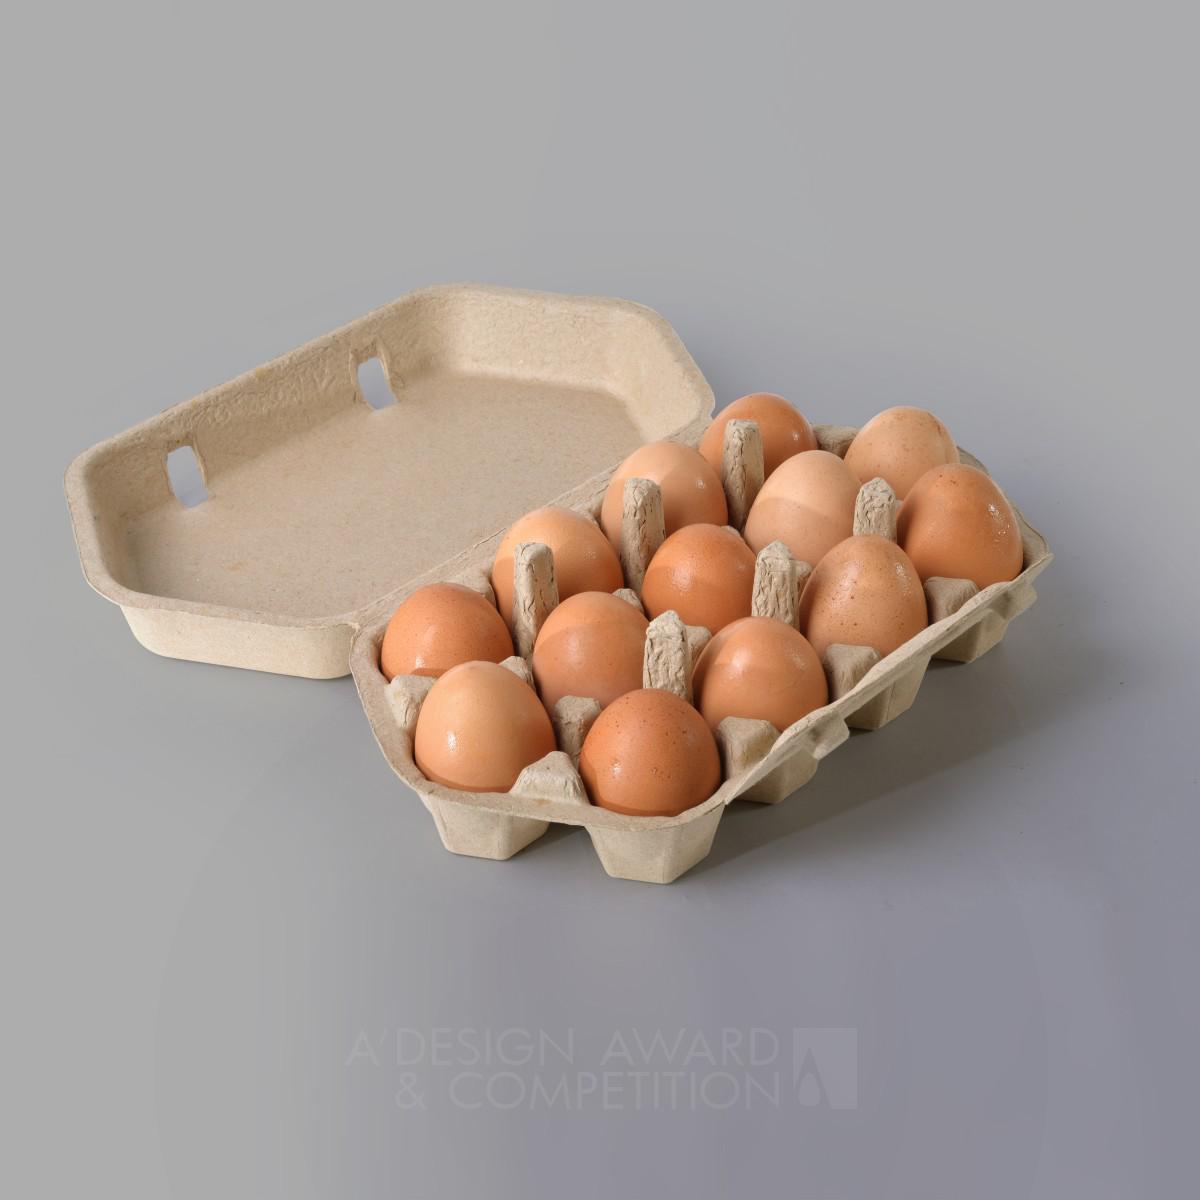 Bakers Dozen 13 Pack Egg Carton